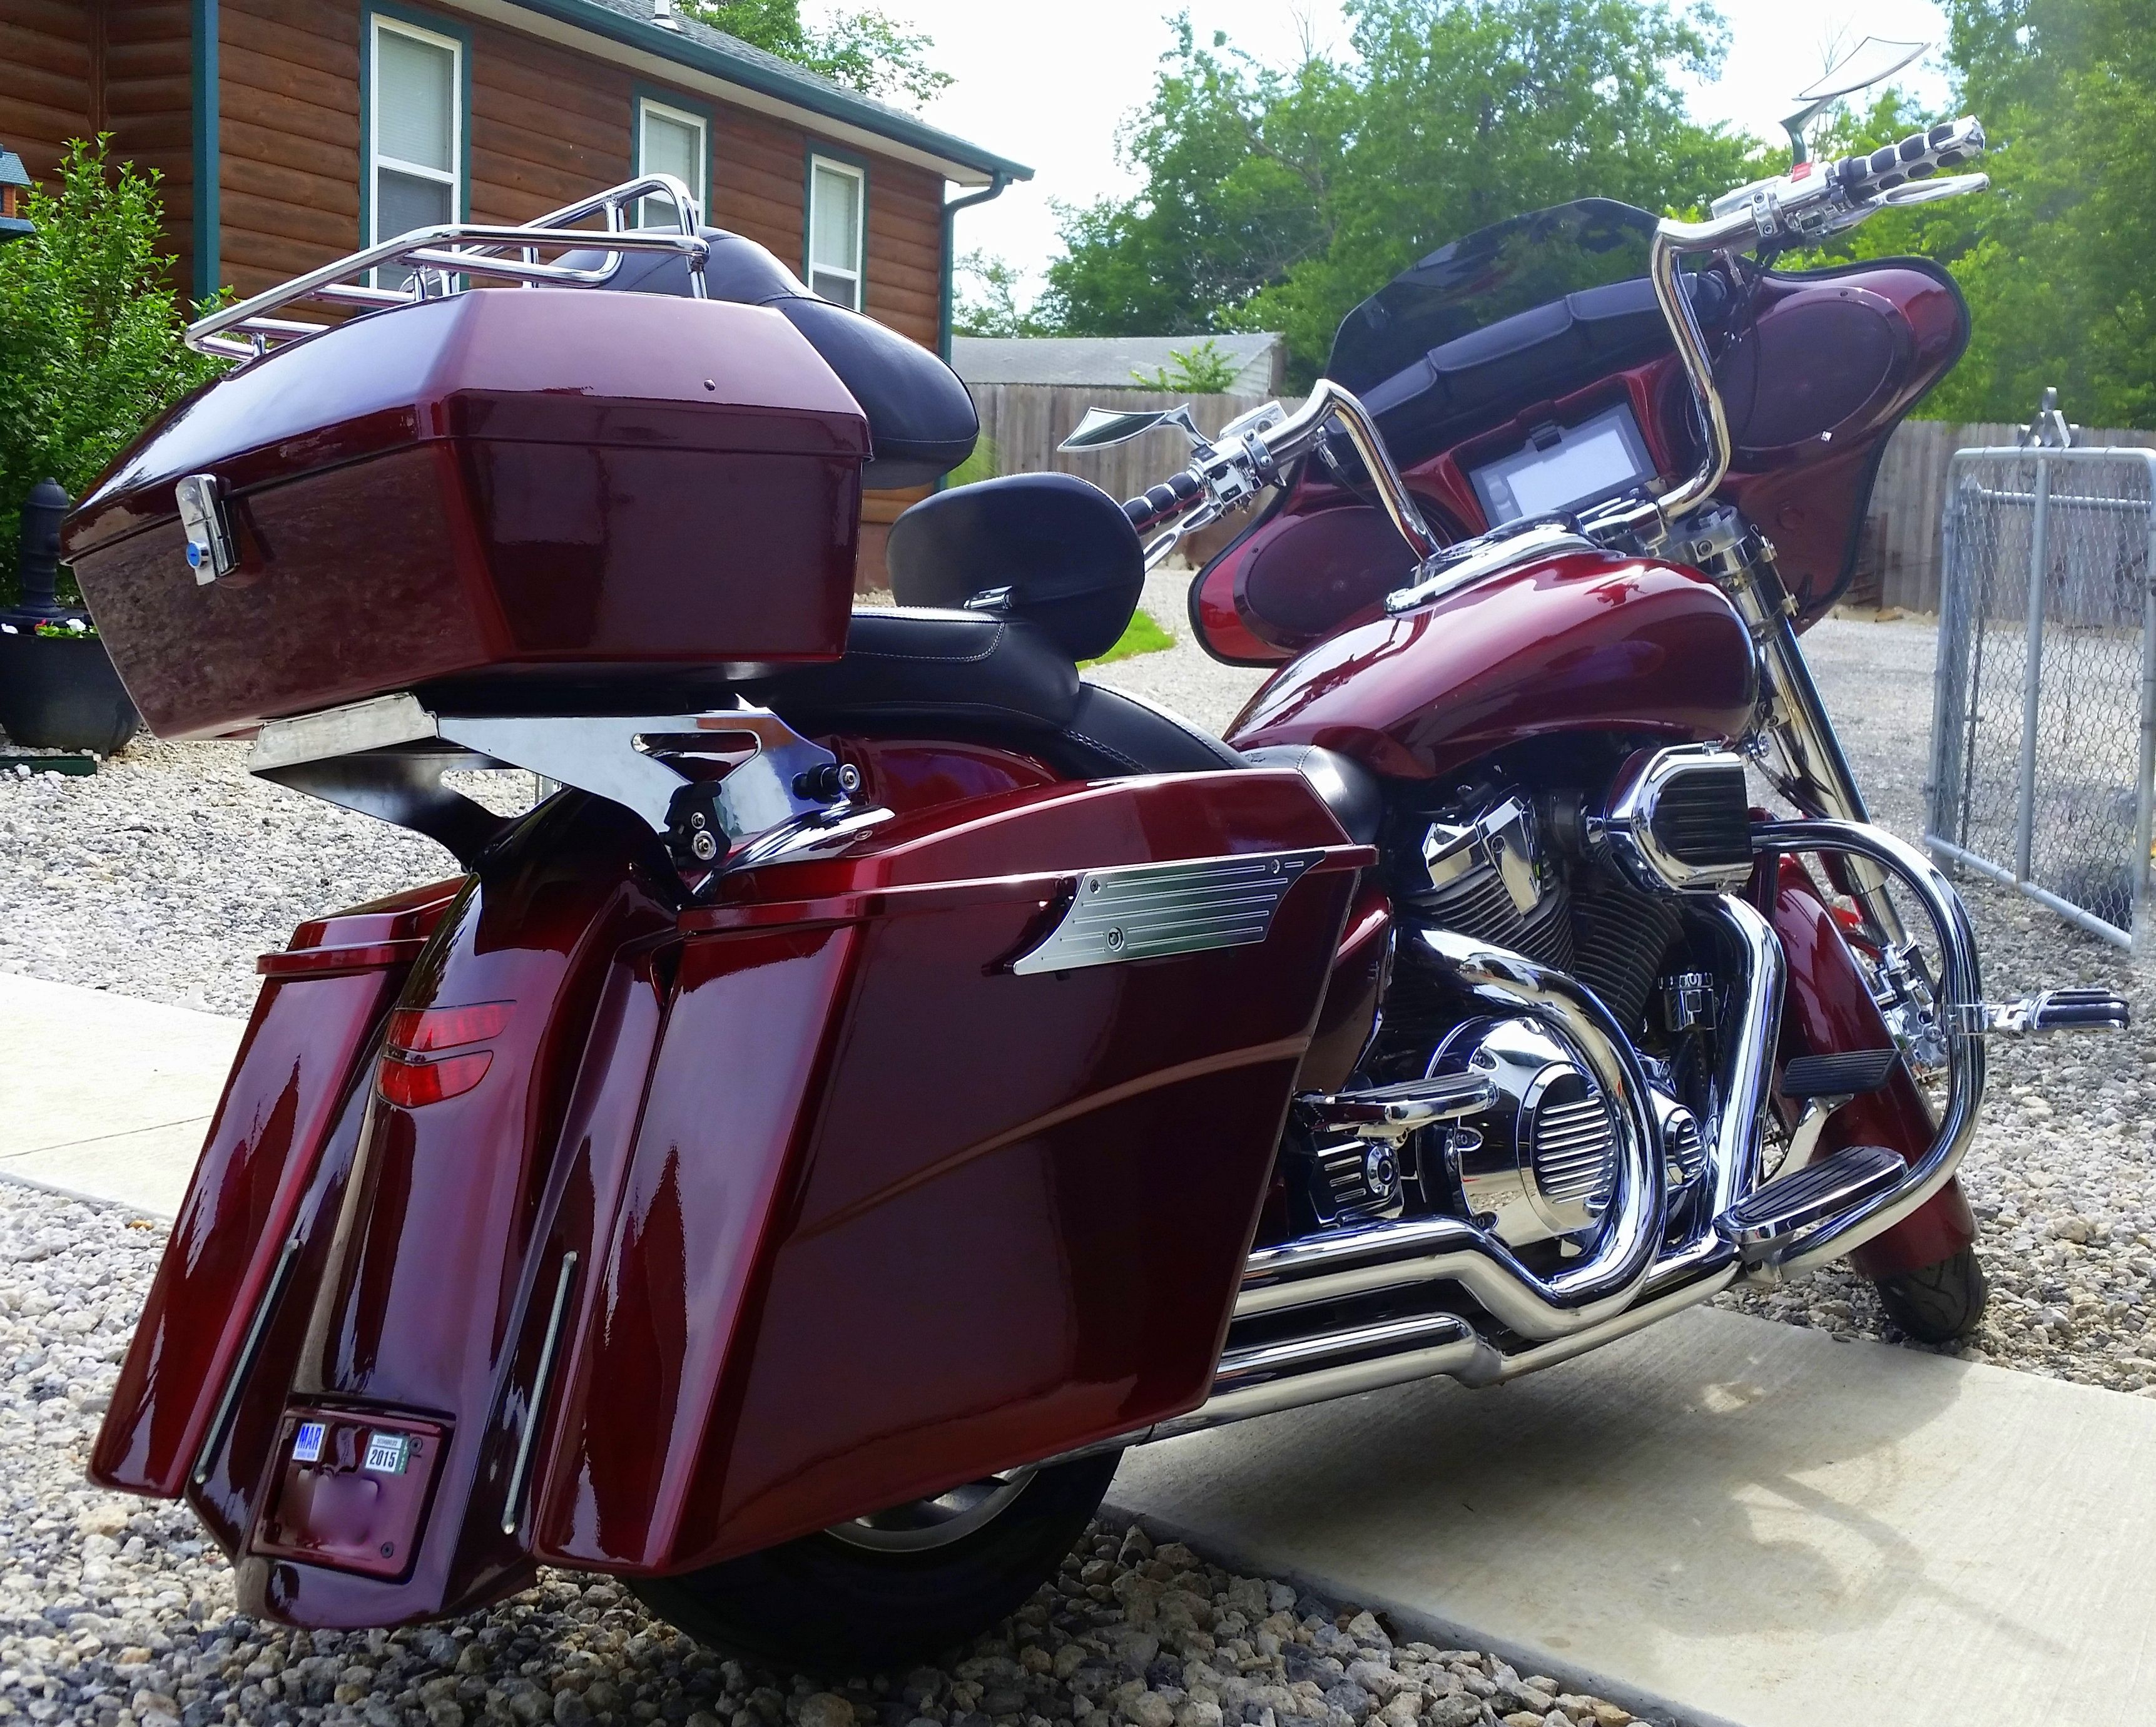 honda 1800 vtx 2004 custom baggers harley davidson cars motorcycles honda dream [ 3446 x 2760 Pixel ]